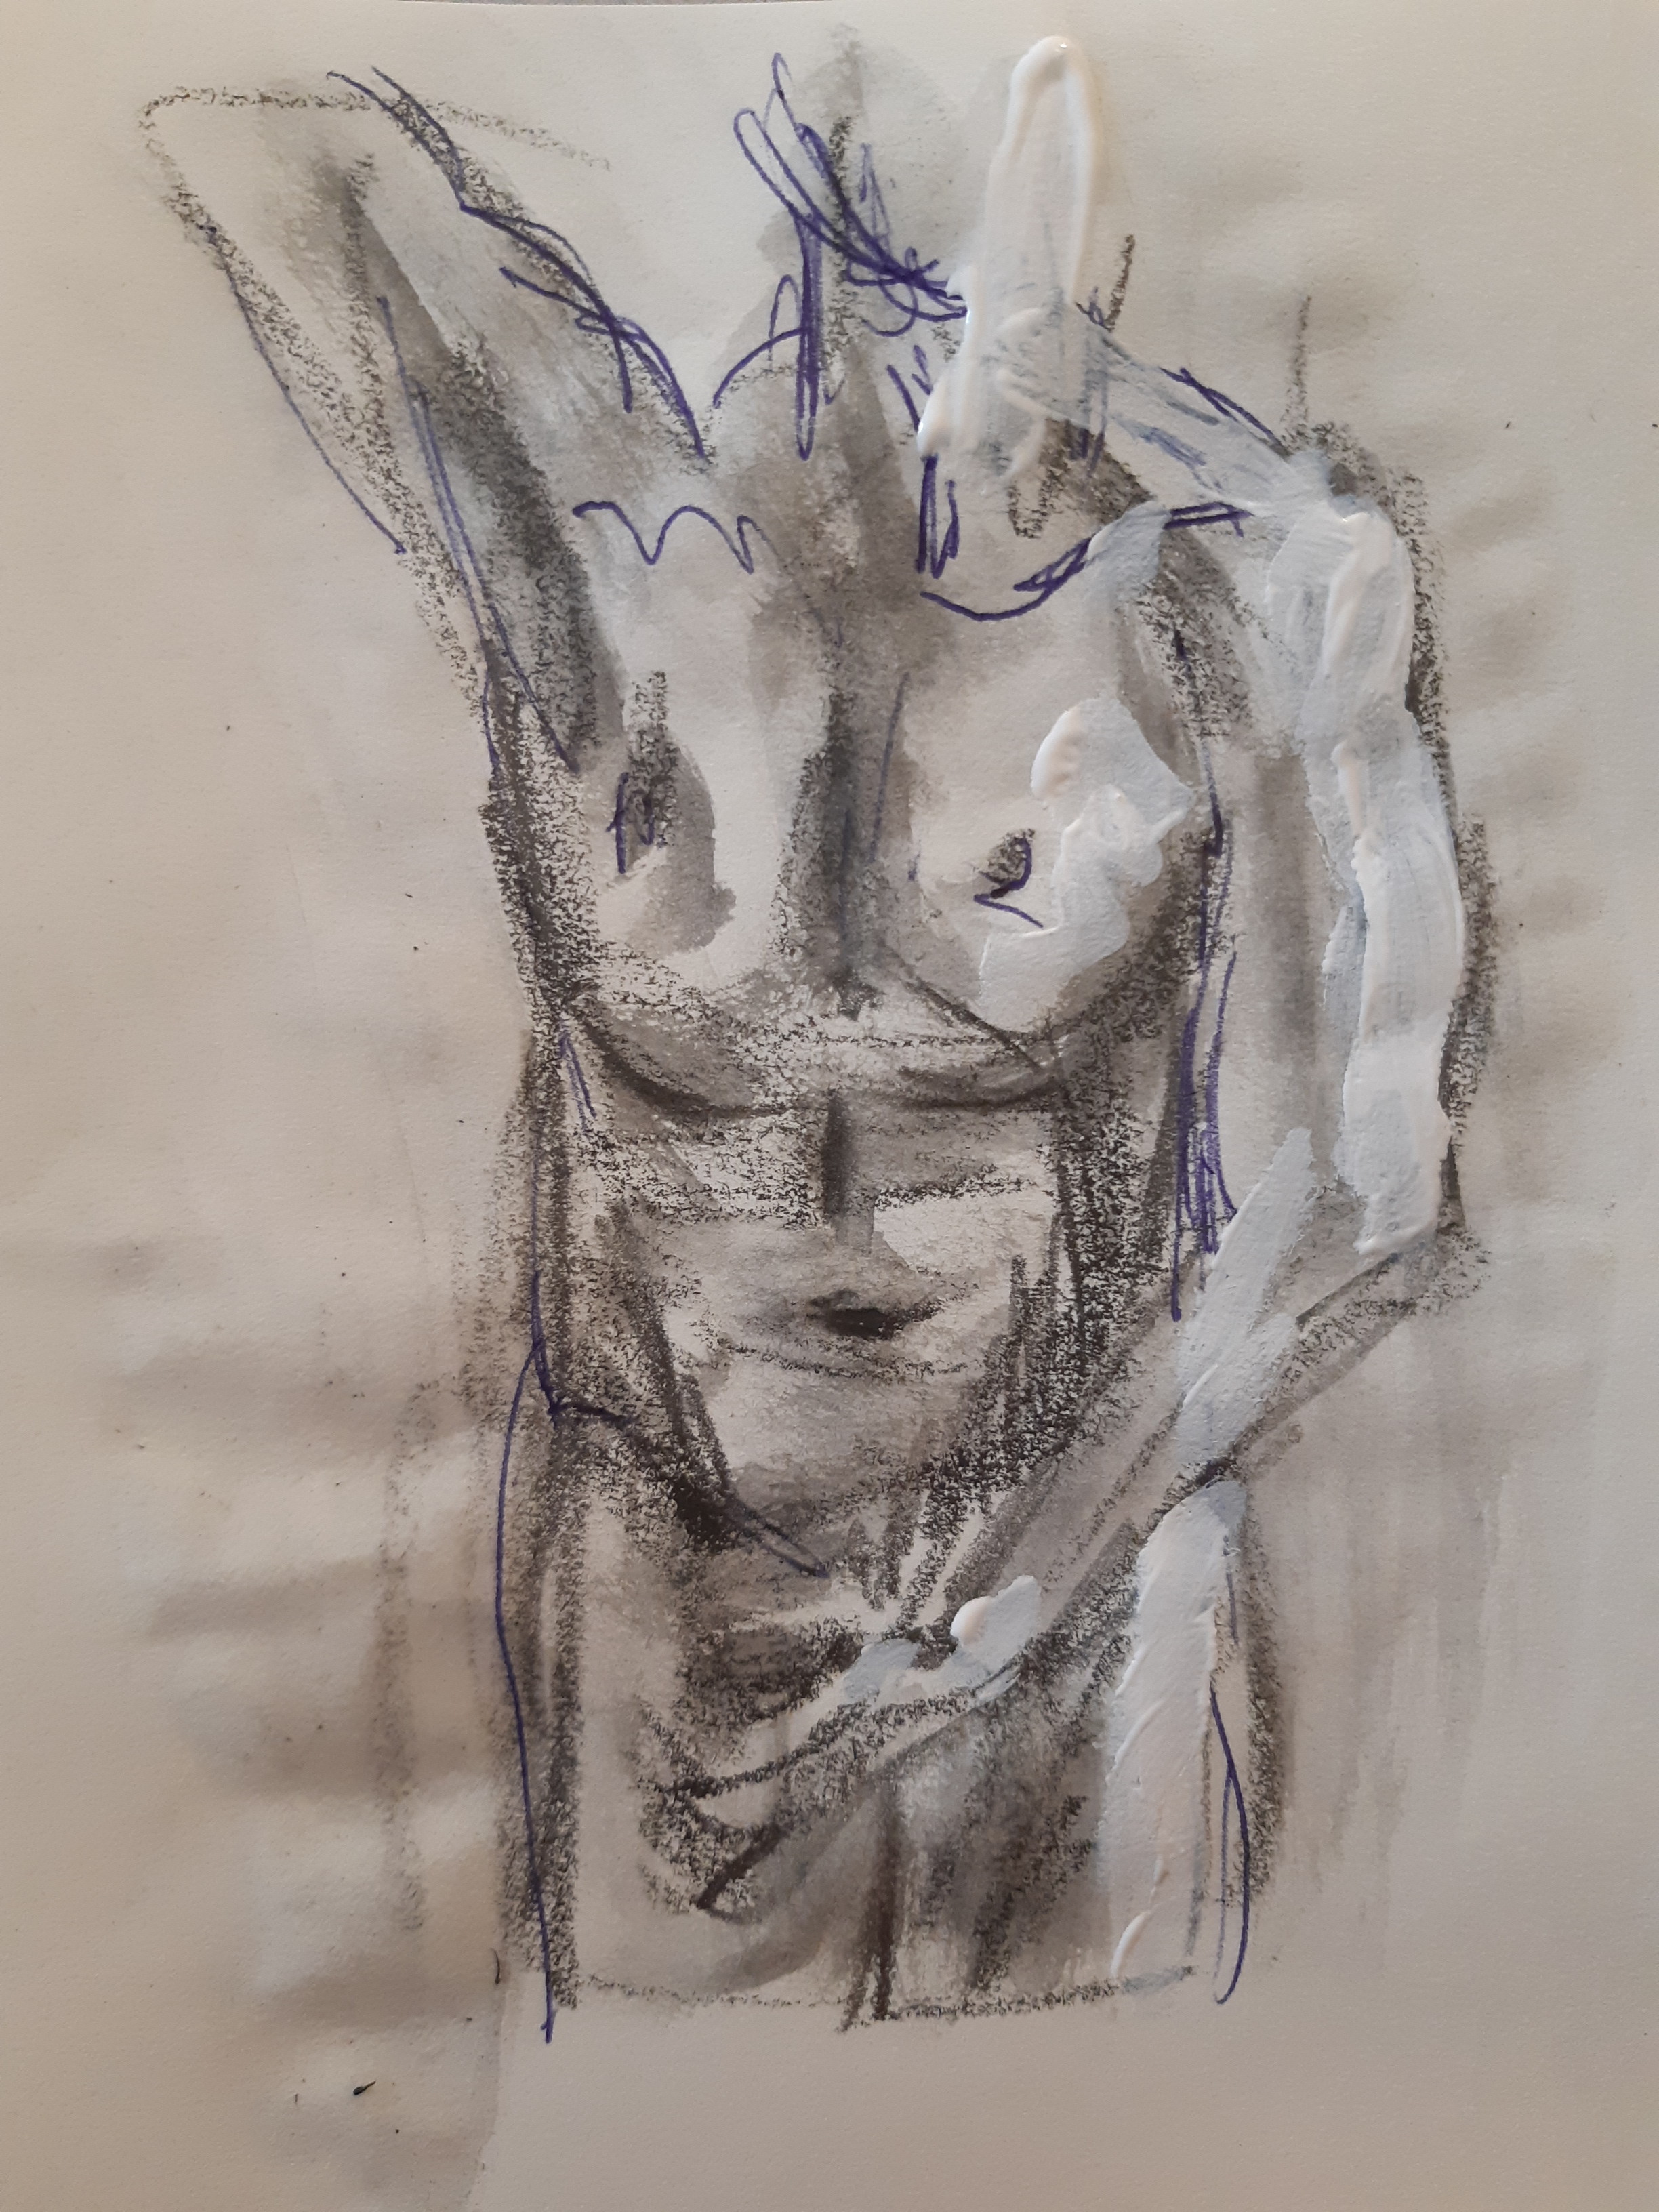 Dessin buste face bic fusain gouache blanche  cours de dessin